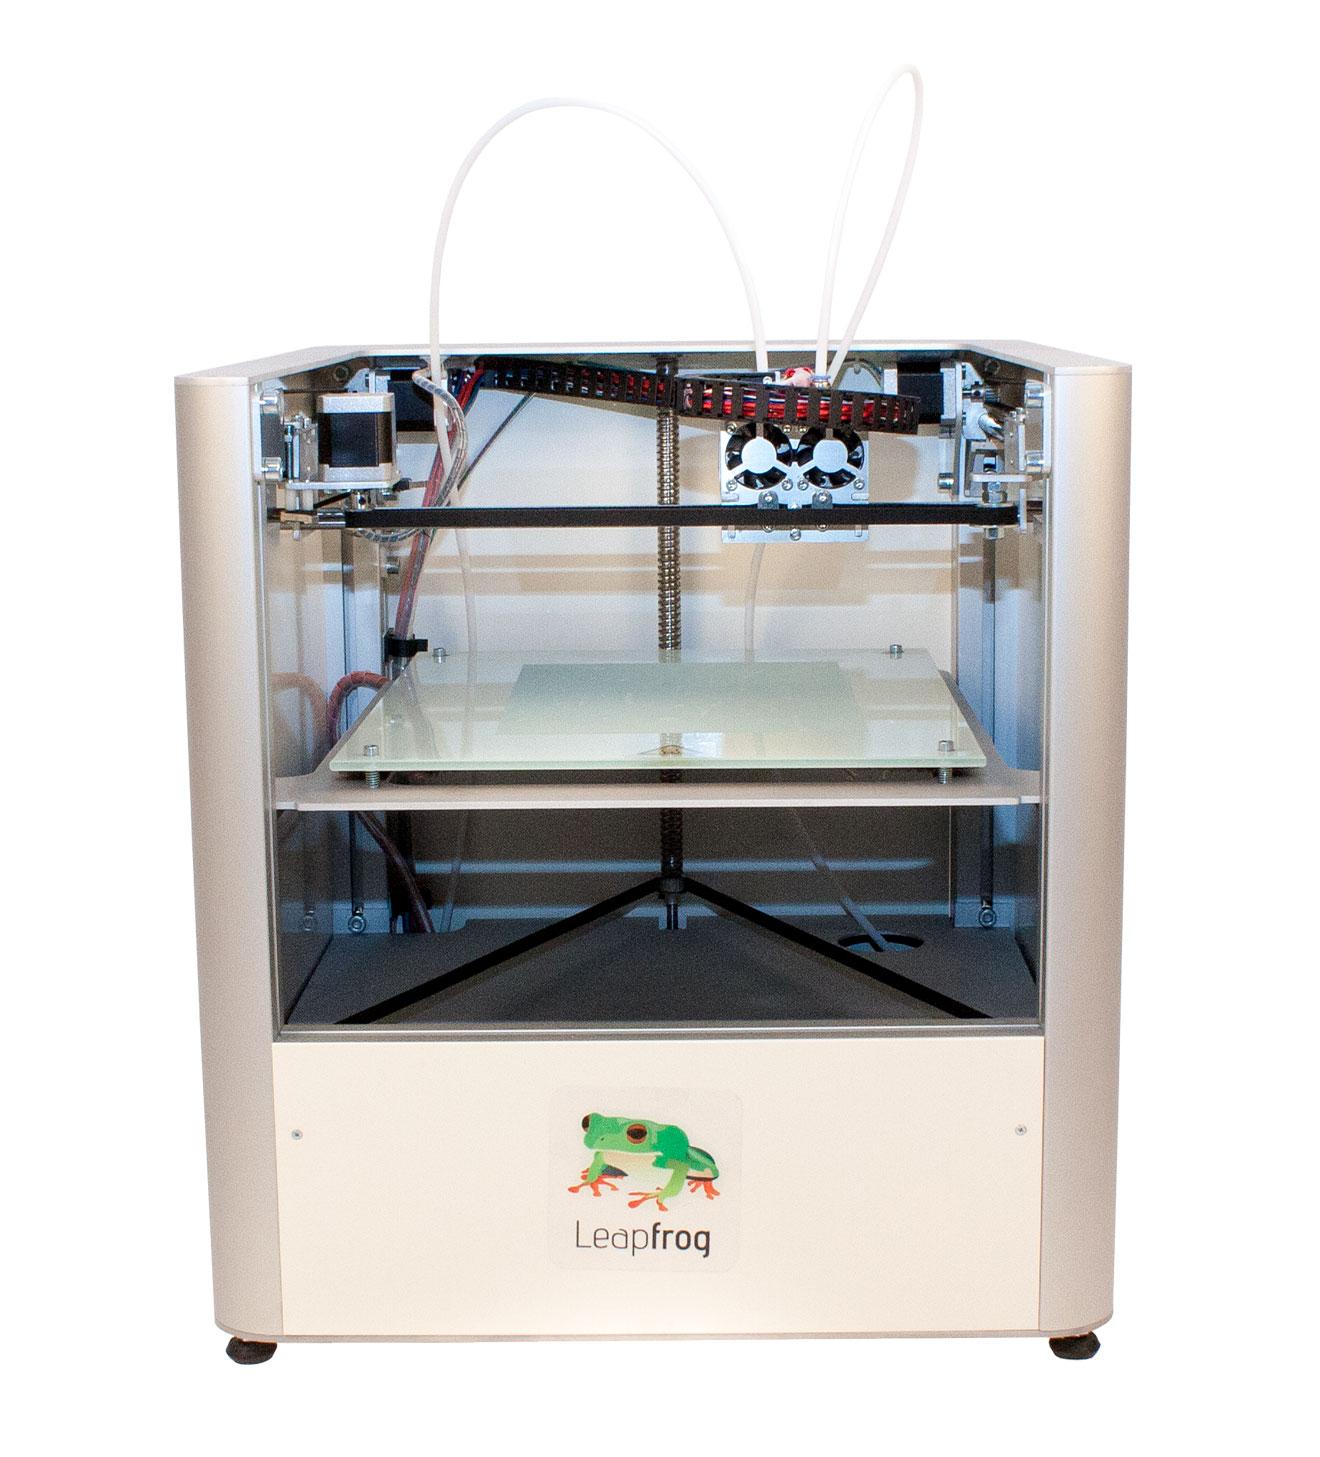 Creatr'14 Leapfrog 3D Printers